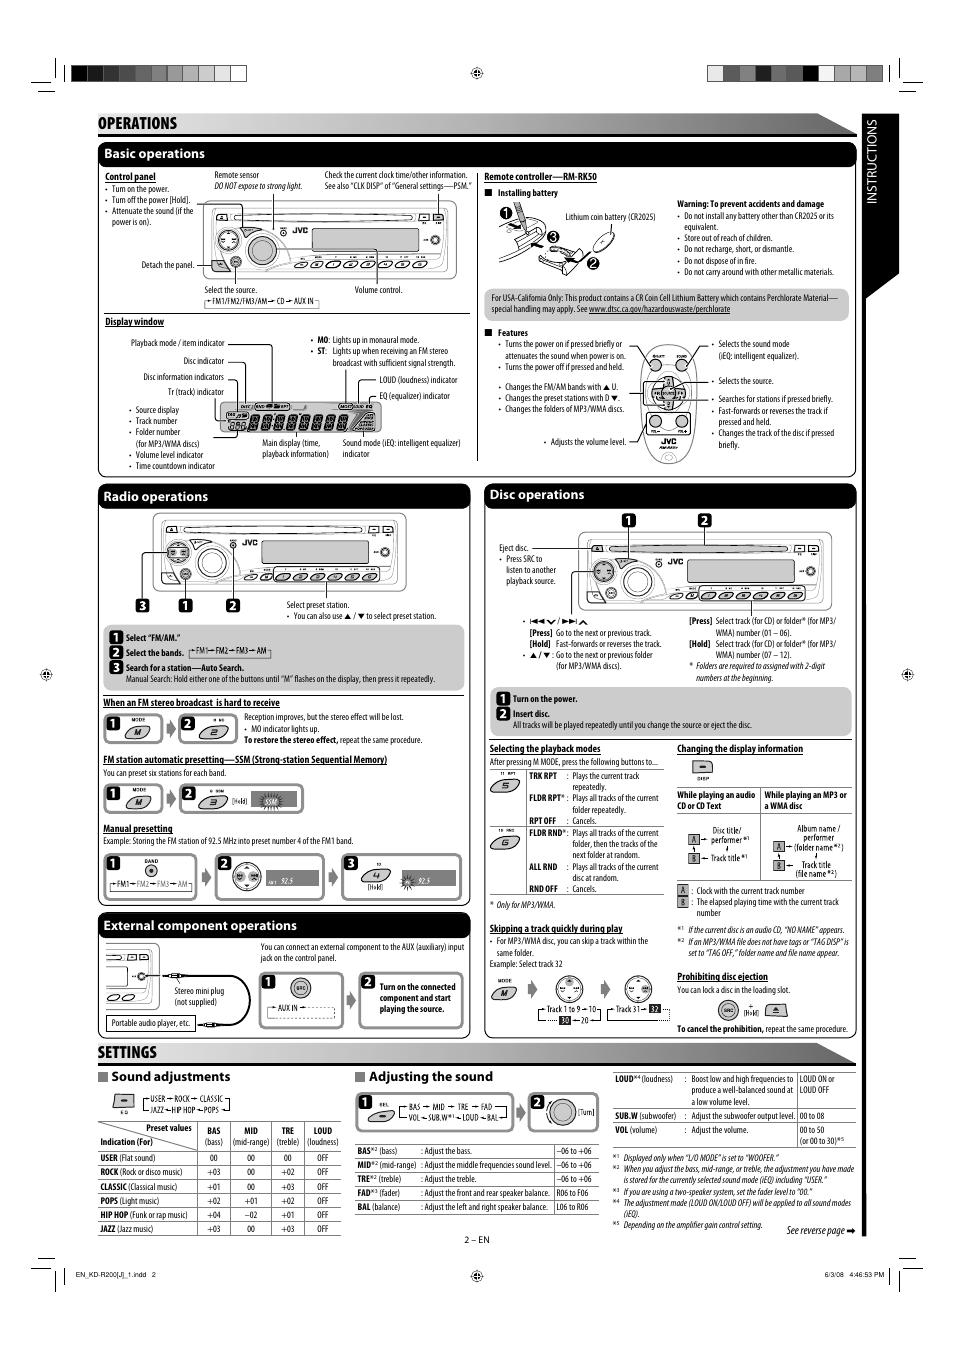 [SCHEMATICS_4JK]  Jvc Kd R200 Wire Diagram Troubleshooting Trailer Lights Wiring Diagram -  engine-diagram.pisang.astrea-construction.fr | Jvc Kd R200 Wire Diagram |  | Begeboy Wiring Diagram Source - astrea-construction.fr